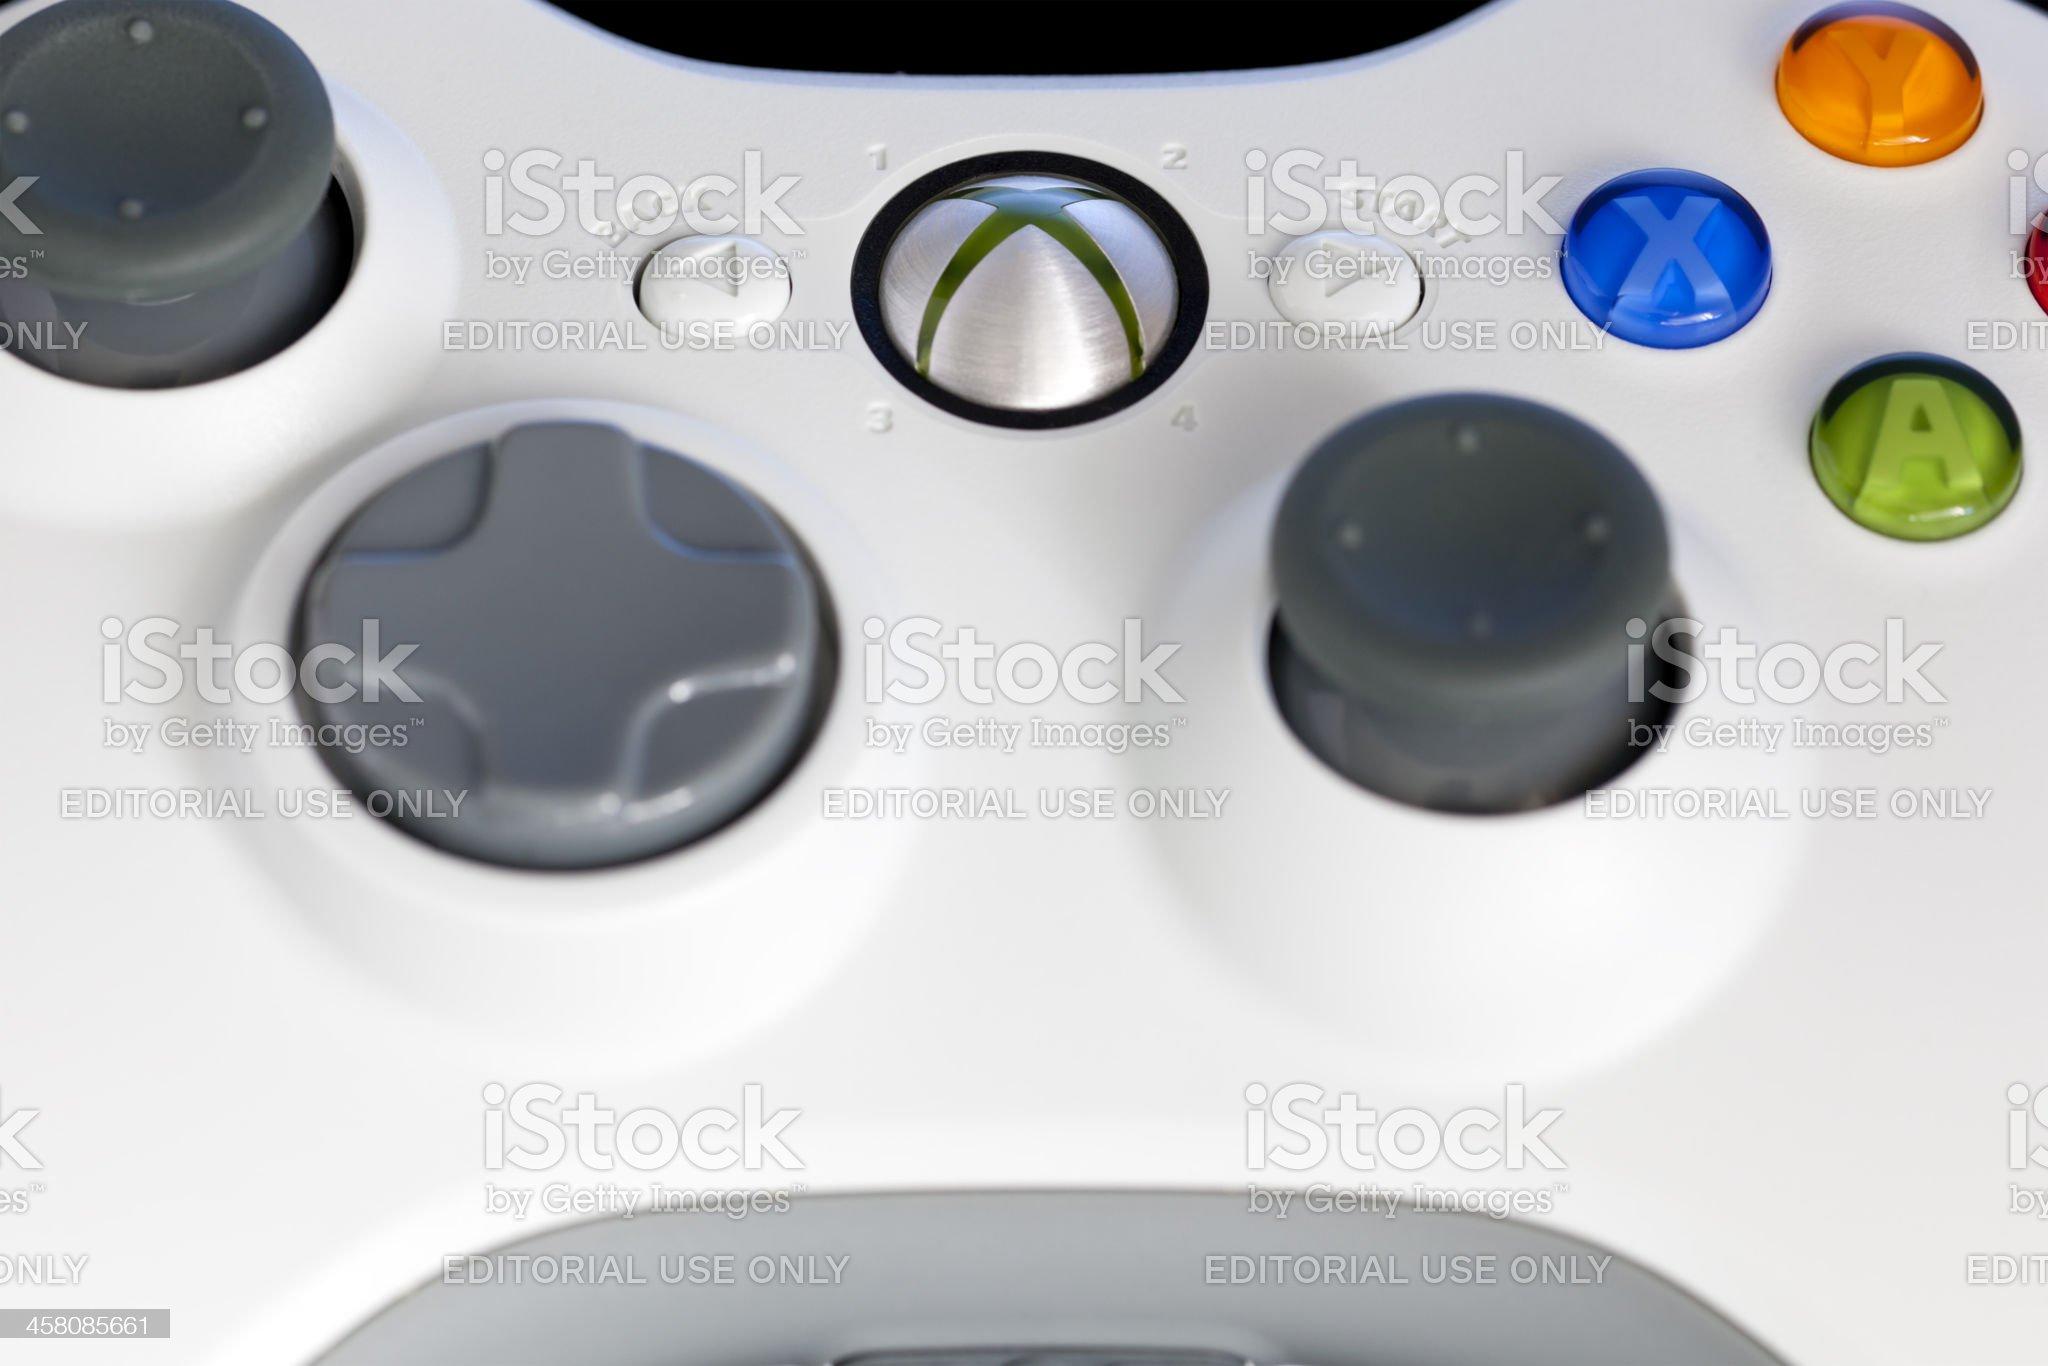 Xbox 360 controller royalty-free stock photo